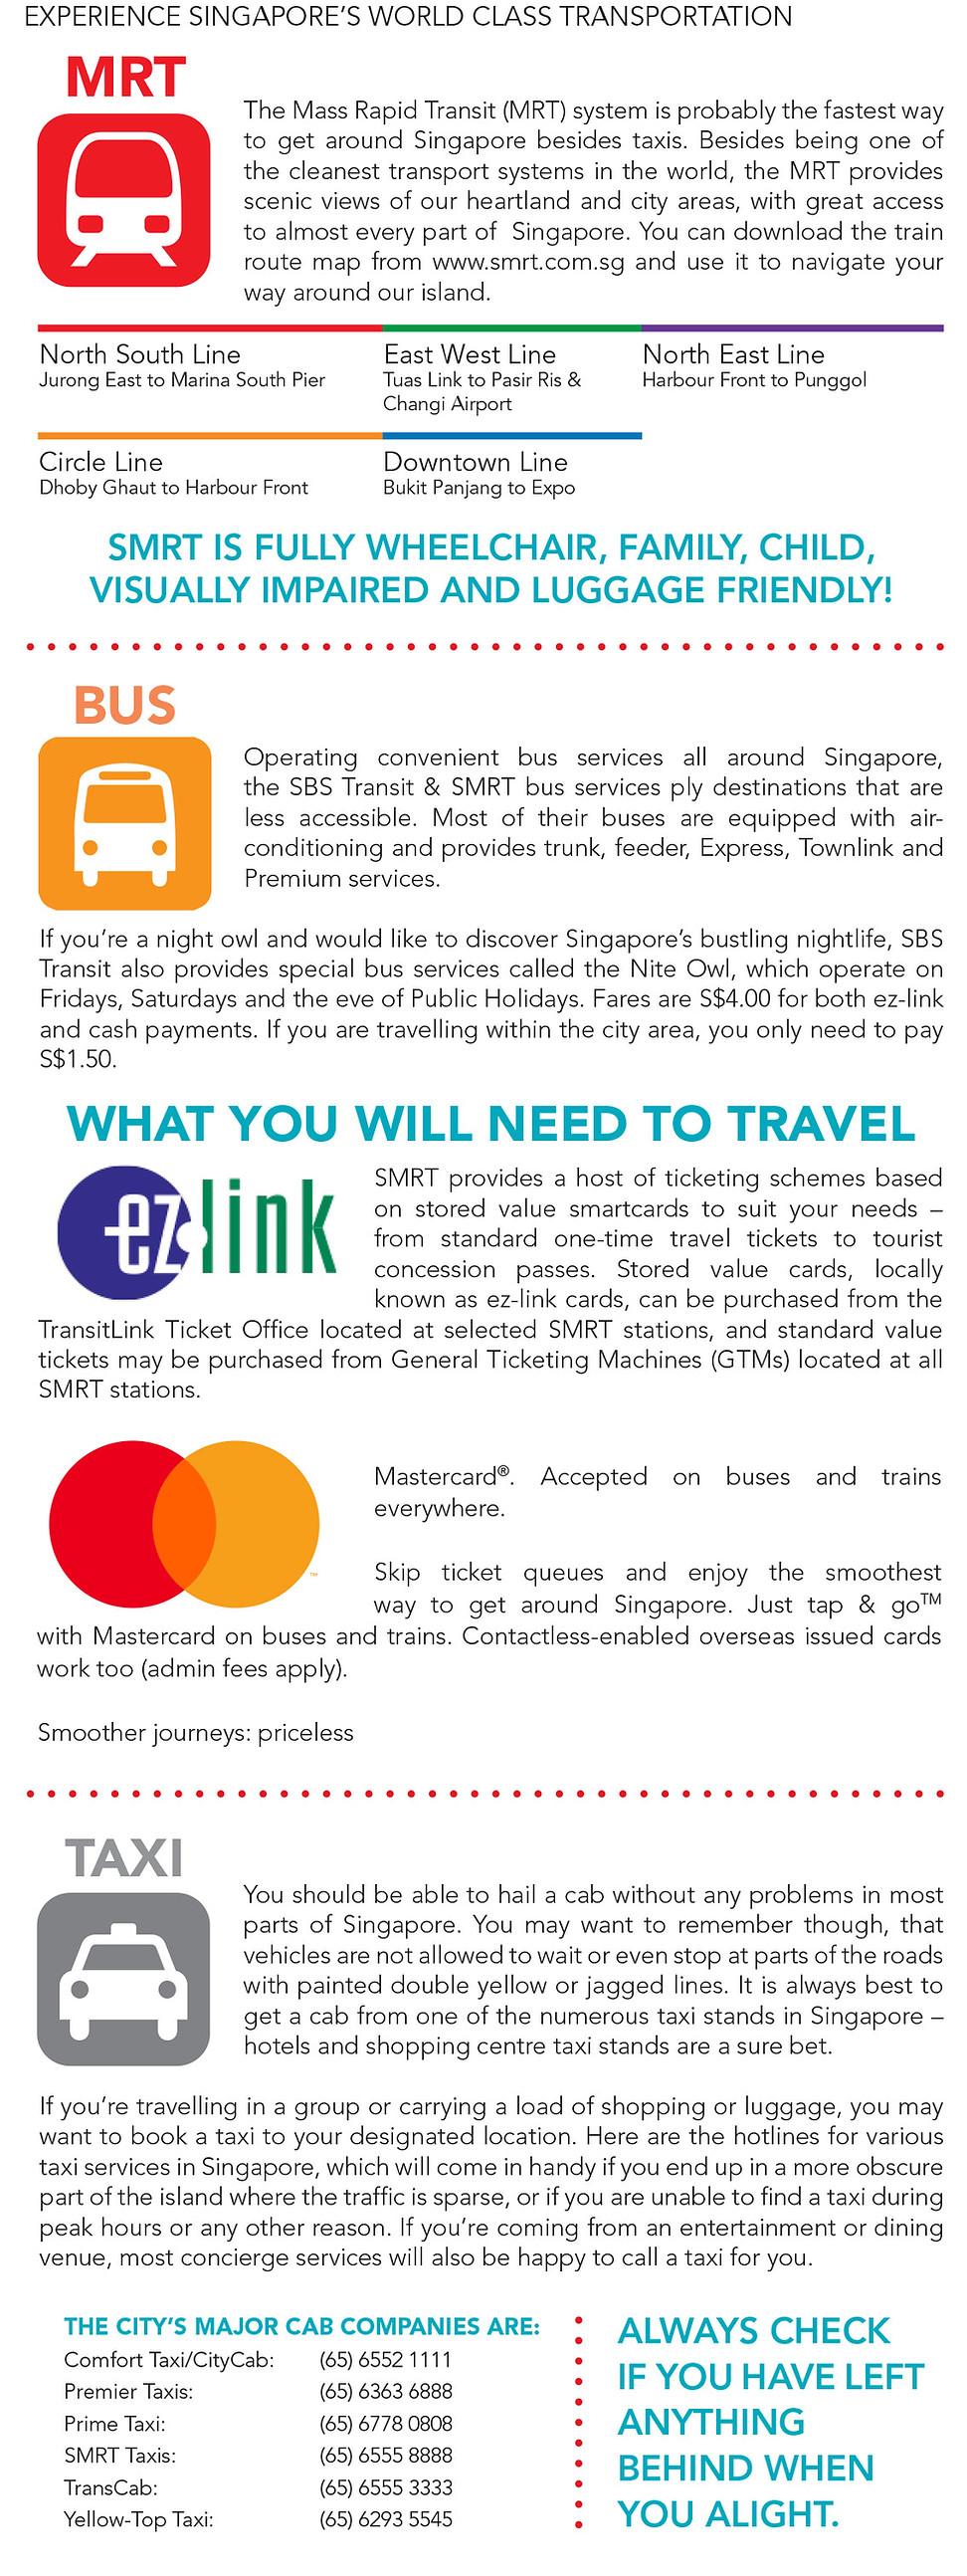 TOURIST-INFO-TRAVEL-TIPS-MASTERCARD.jpg